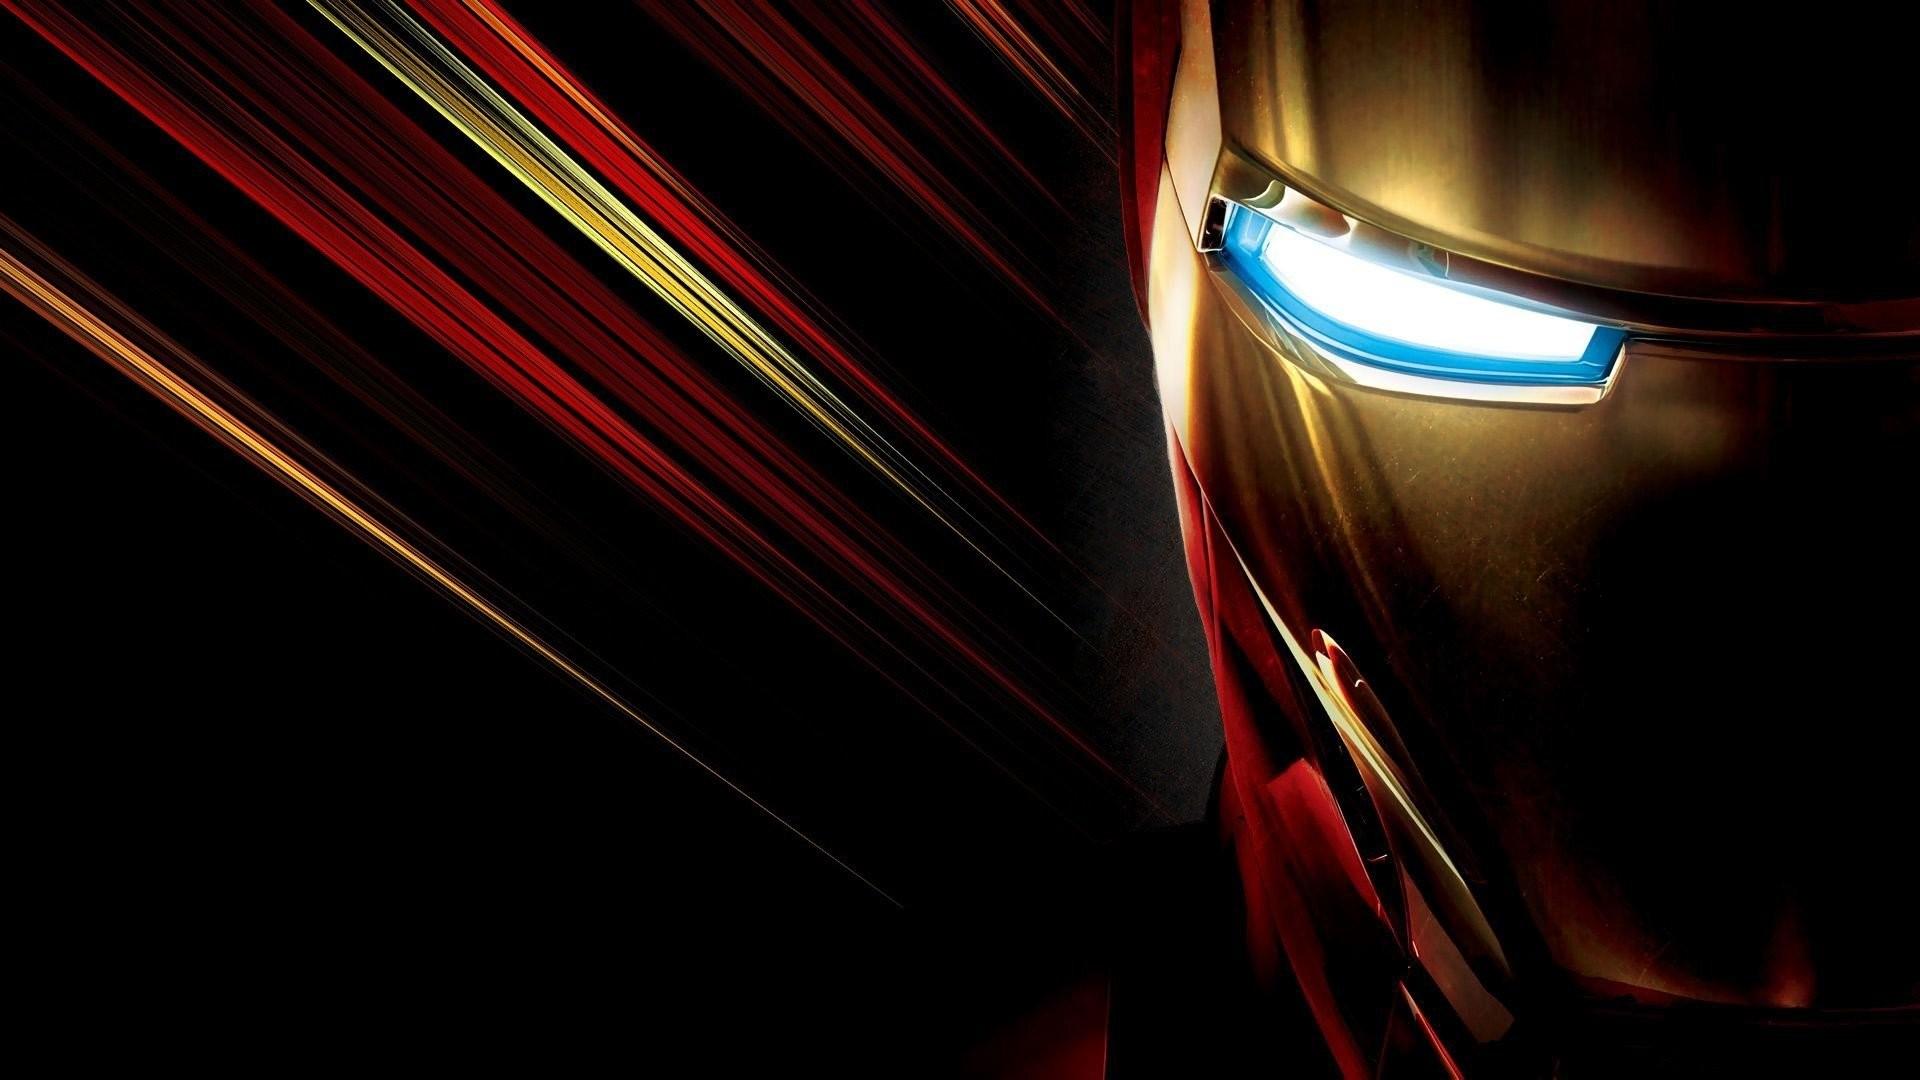 The Avengers Iron Man HD Wallpapers Avengers Hd Wallpaper Wallpapers)